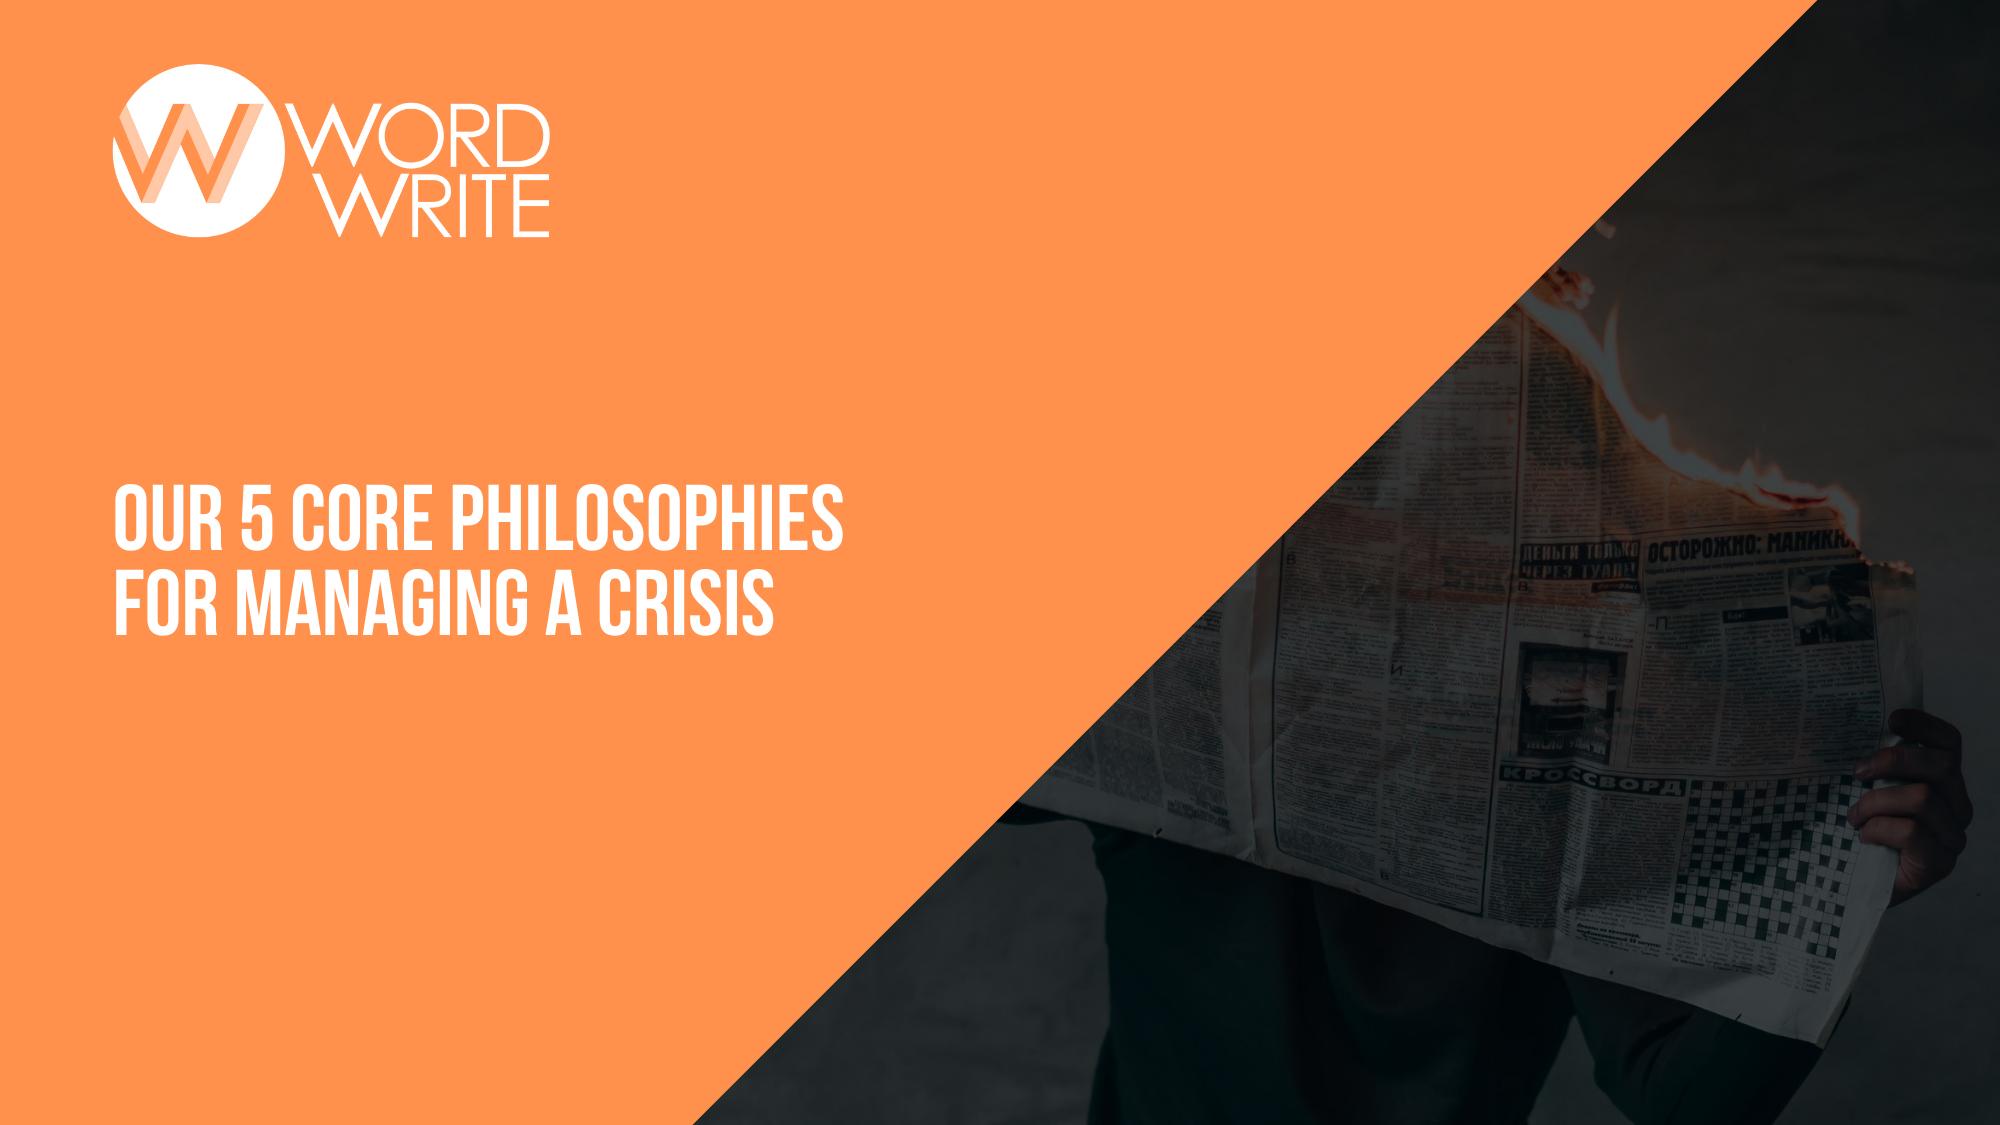 Crisis philosophies